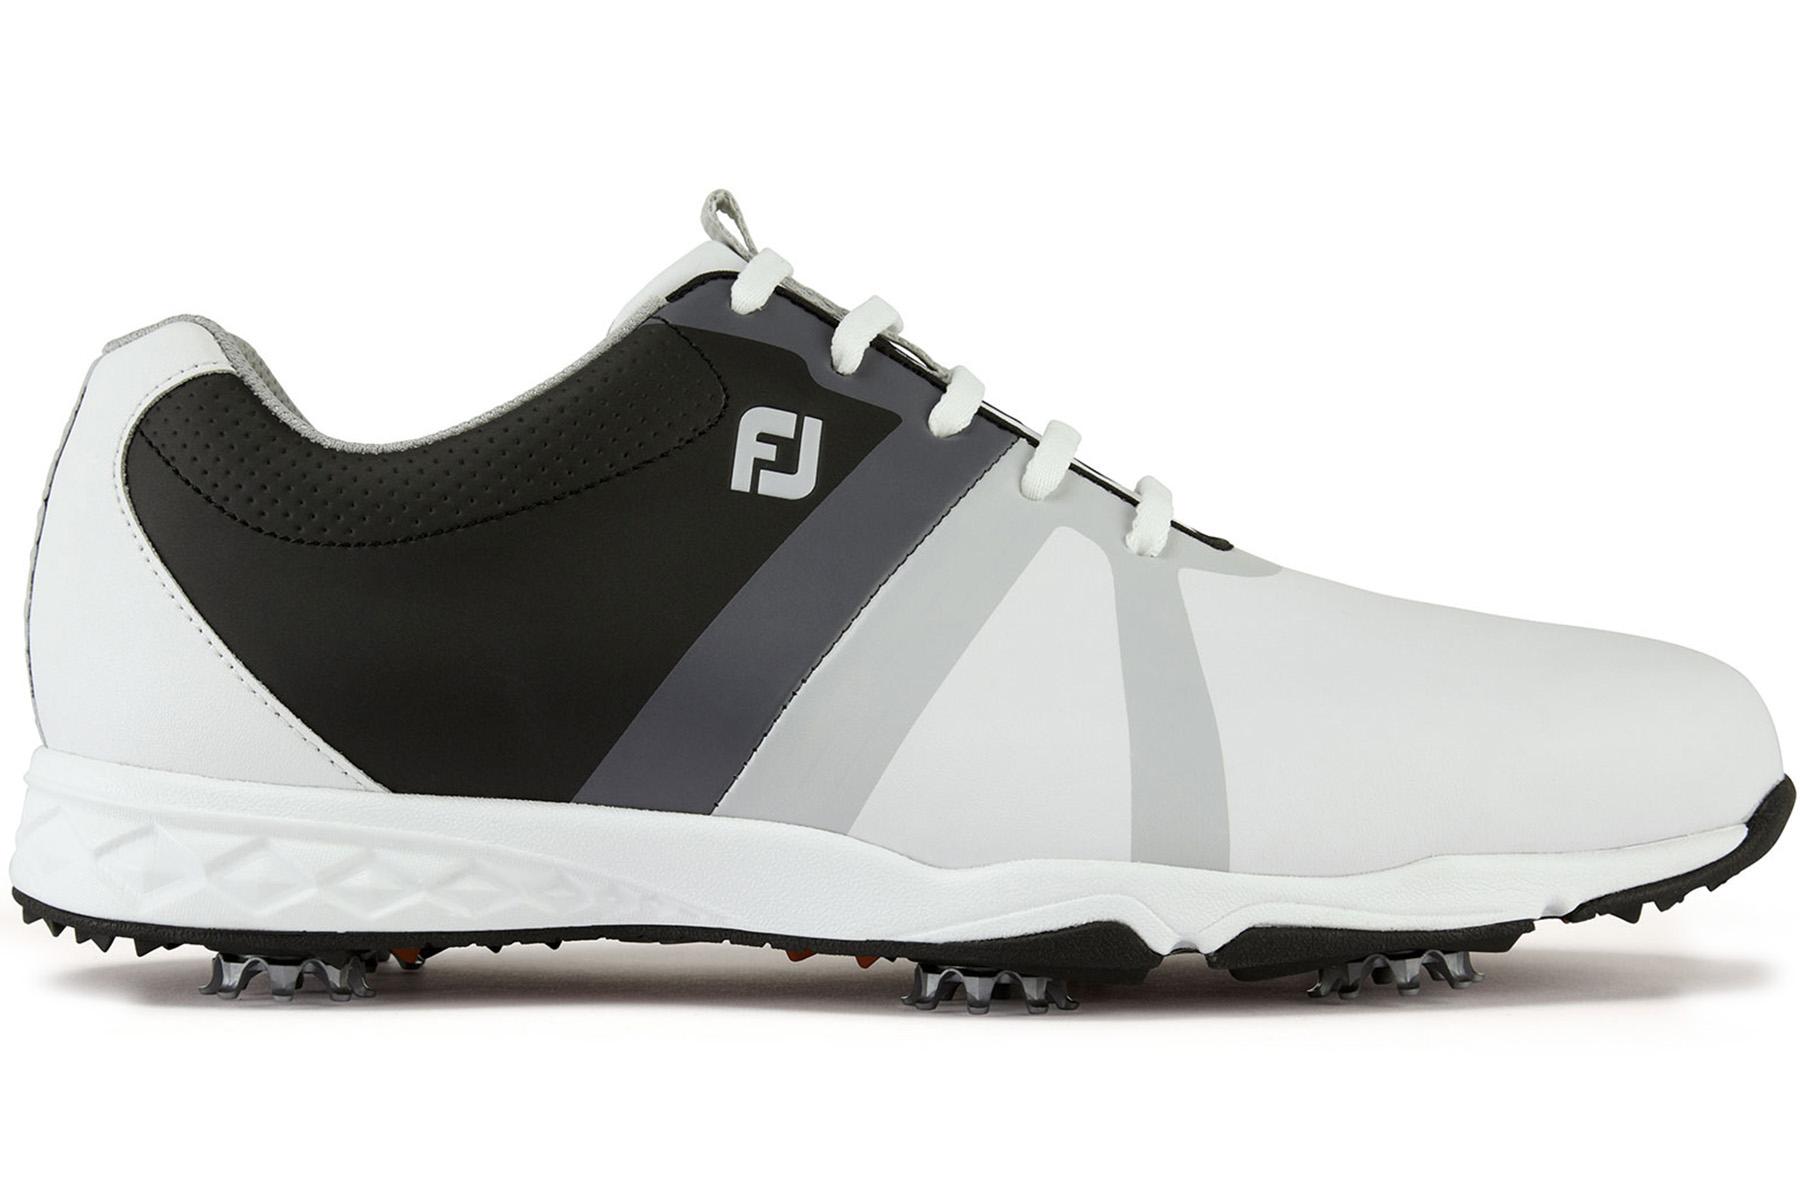 Buy Footjoy Golf Shoes Online